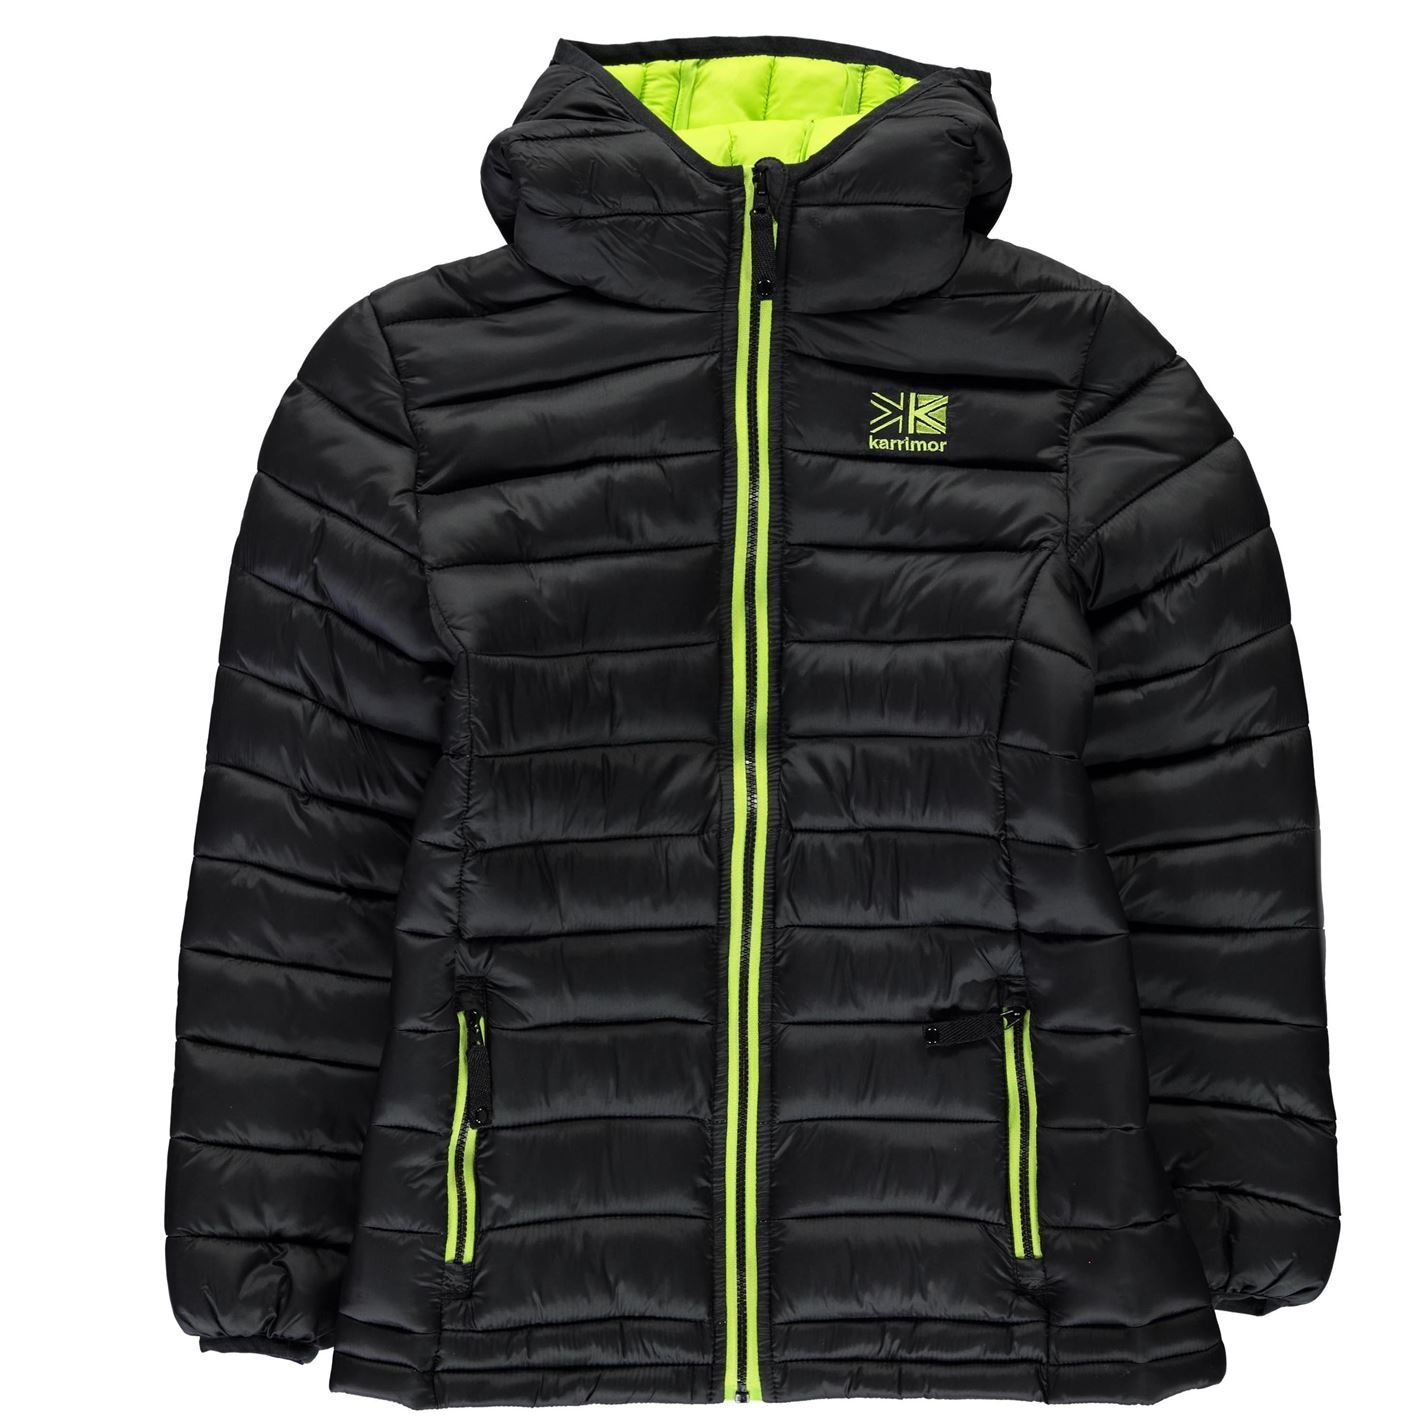 8d8058533 Amazon.com: Karrimor Kids Hot Crag Insulated Jacket Junior Down Coat ...